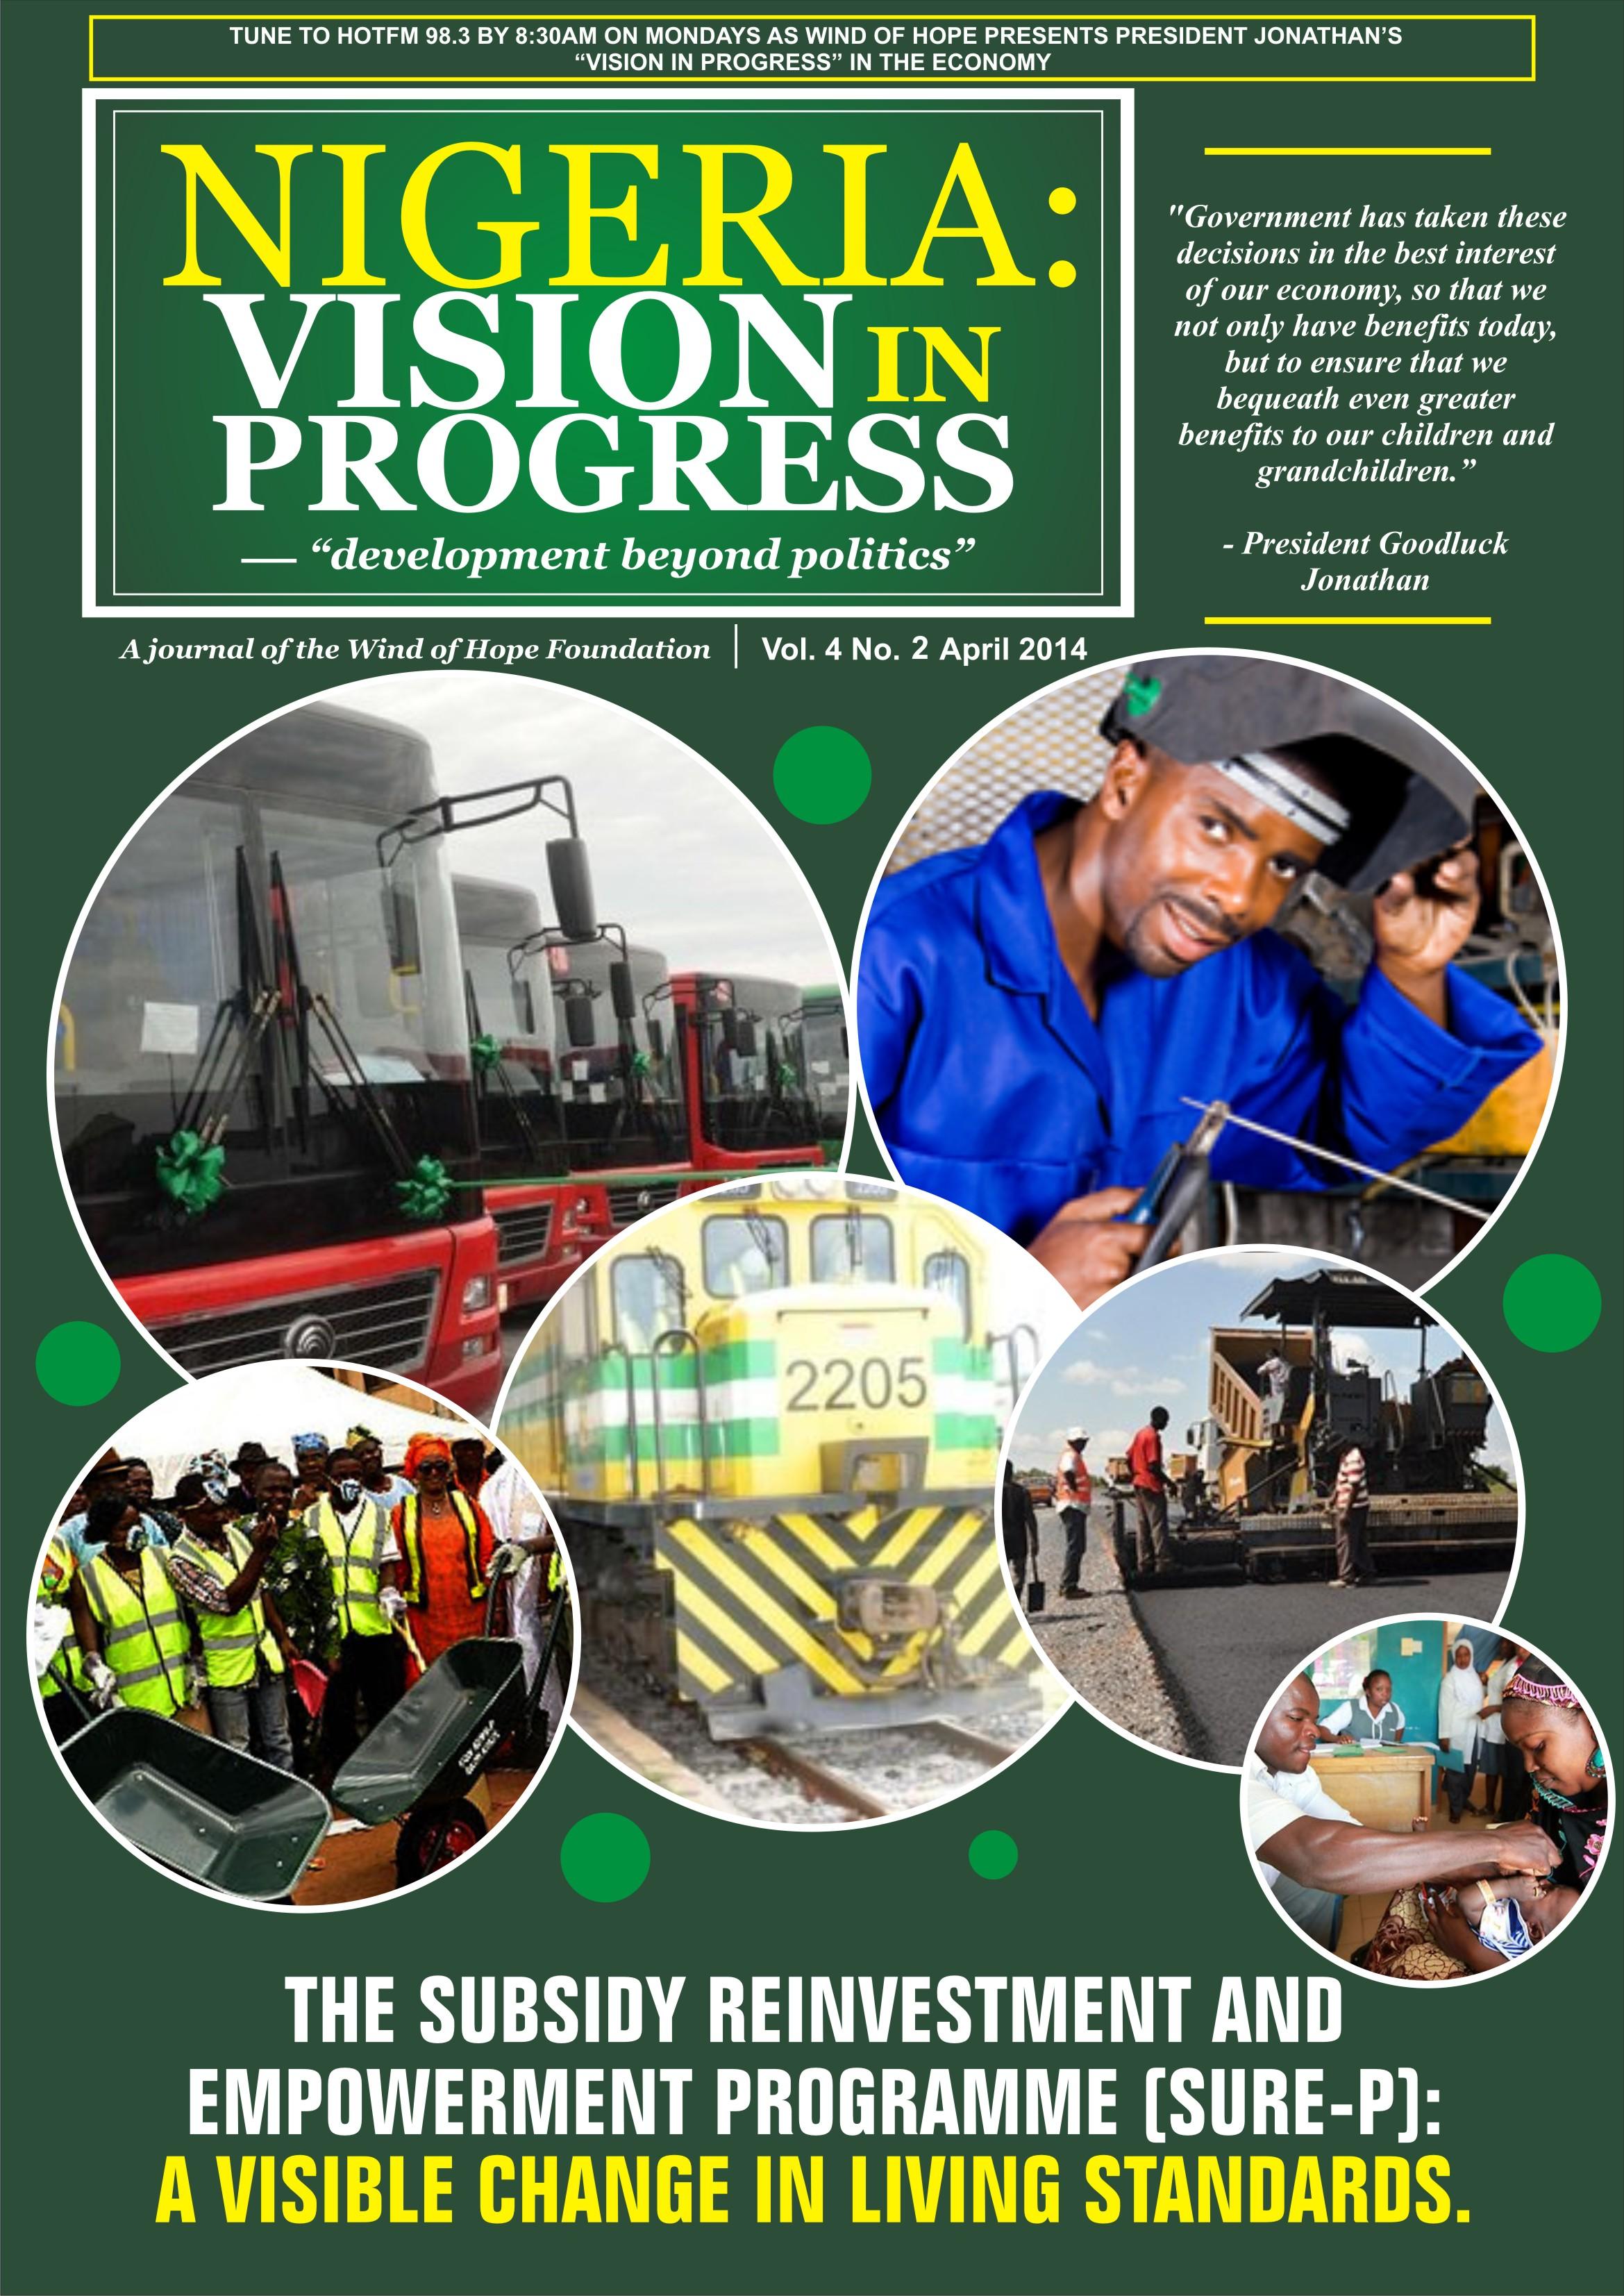 Subsidy reinvestment programme in nigeria artikel norma dan hukum forex